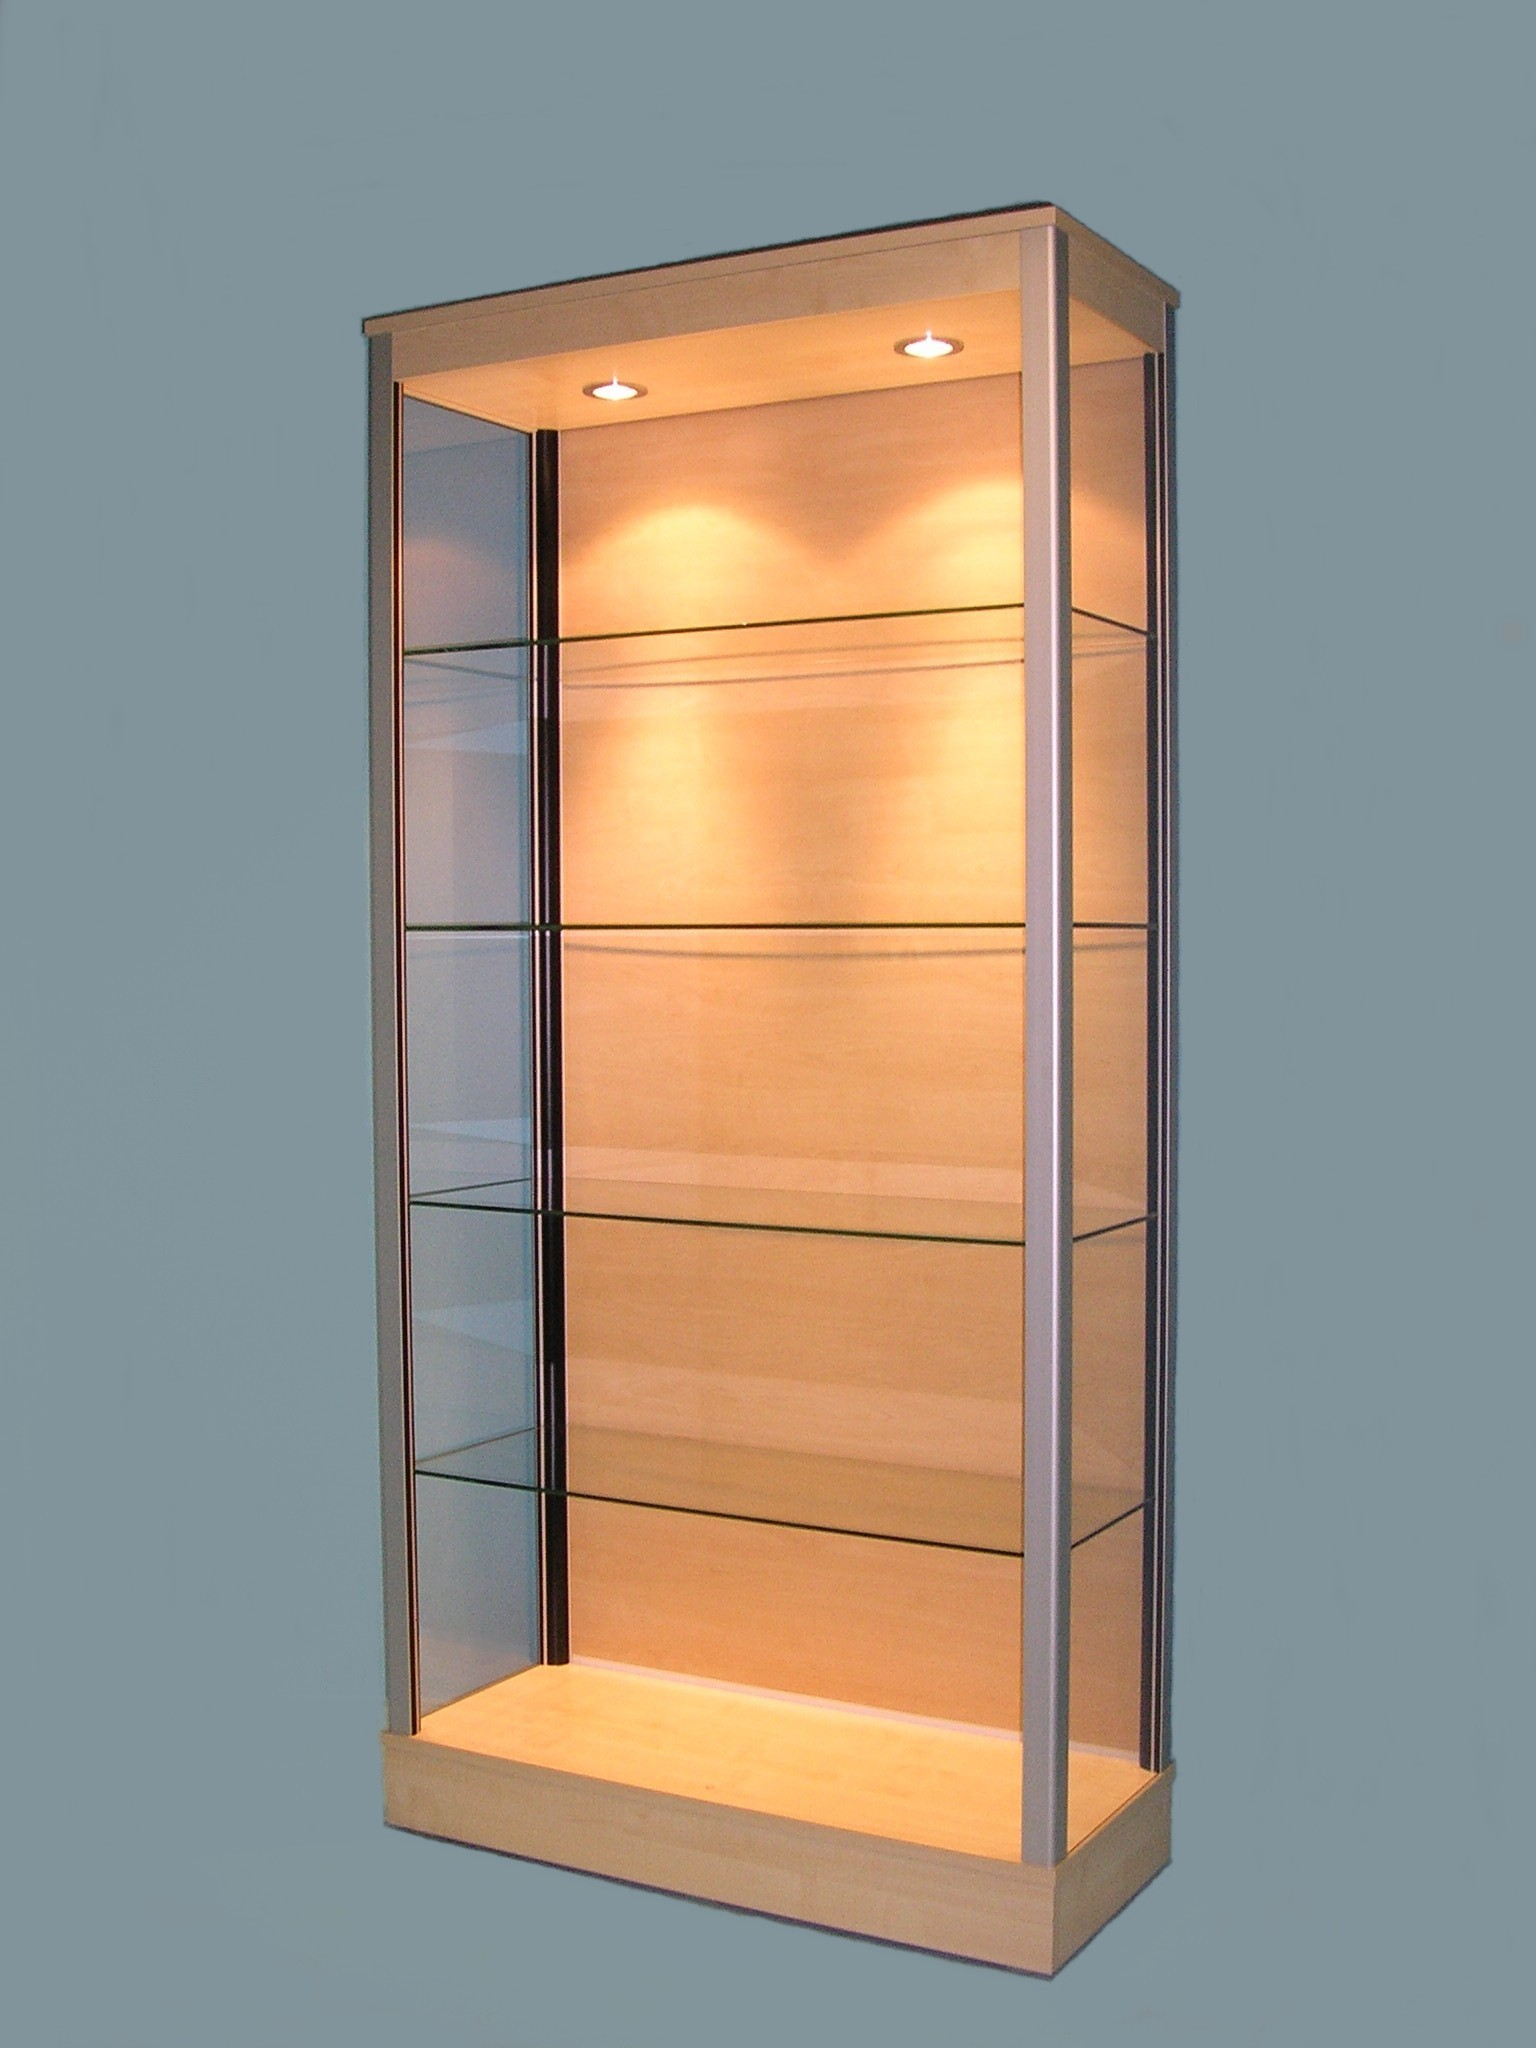 Designex Cabinets maple D15 glass display cabinet